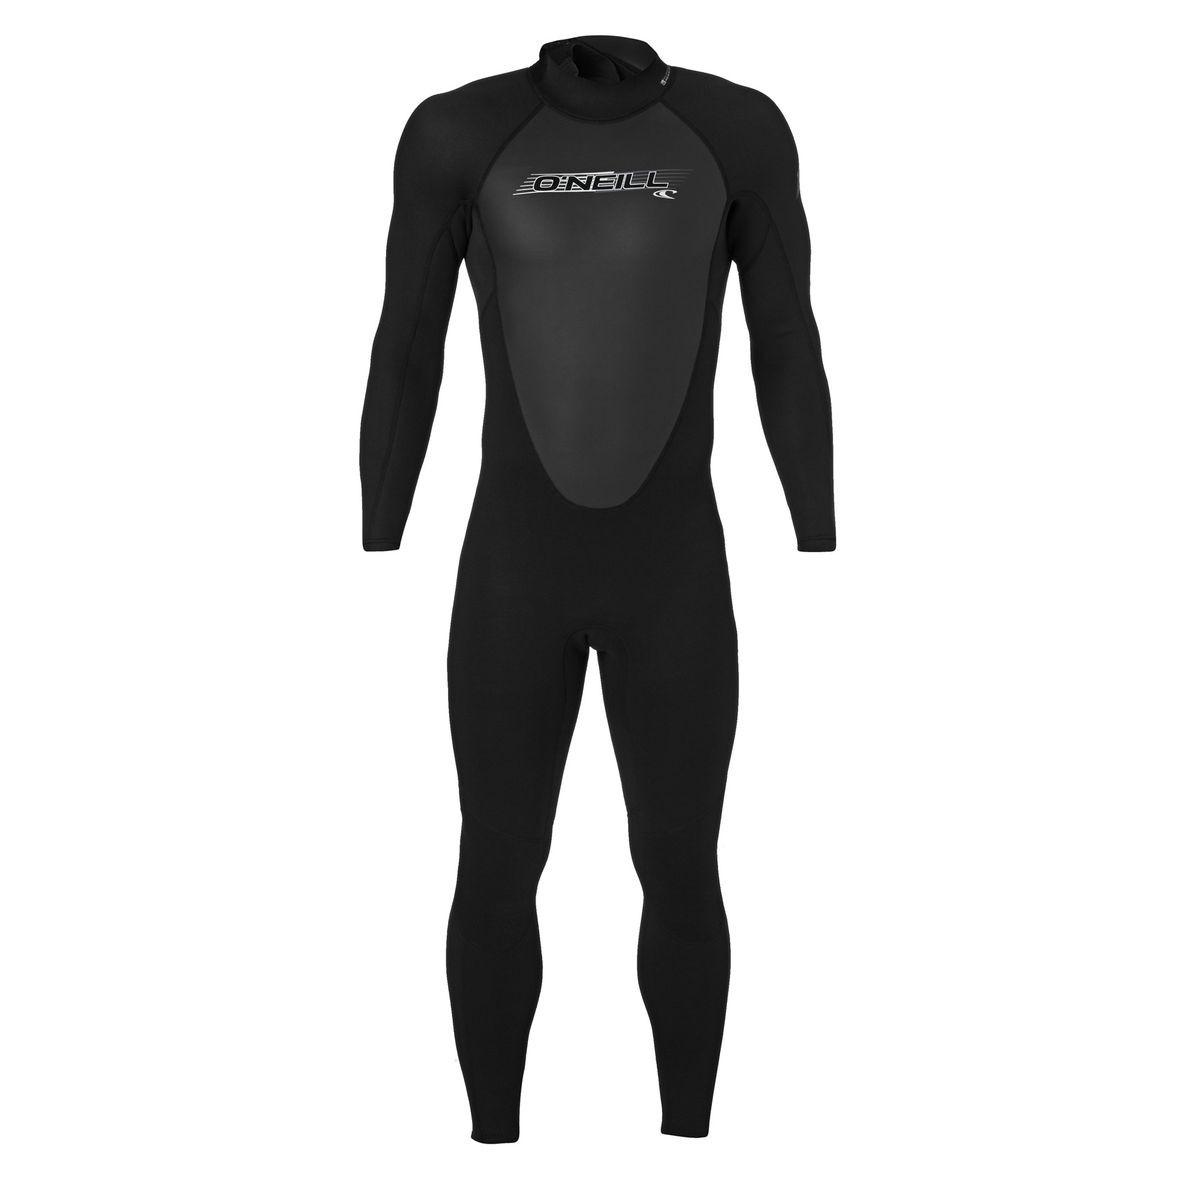 O'Neill Reactor 3/2mm Back Zip Wetsuit - Black